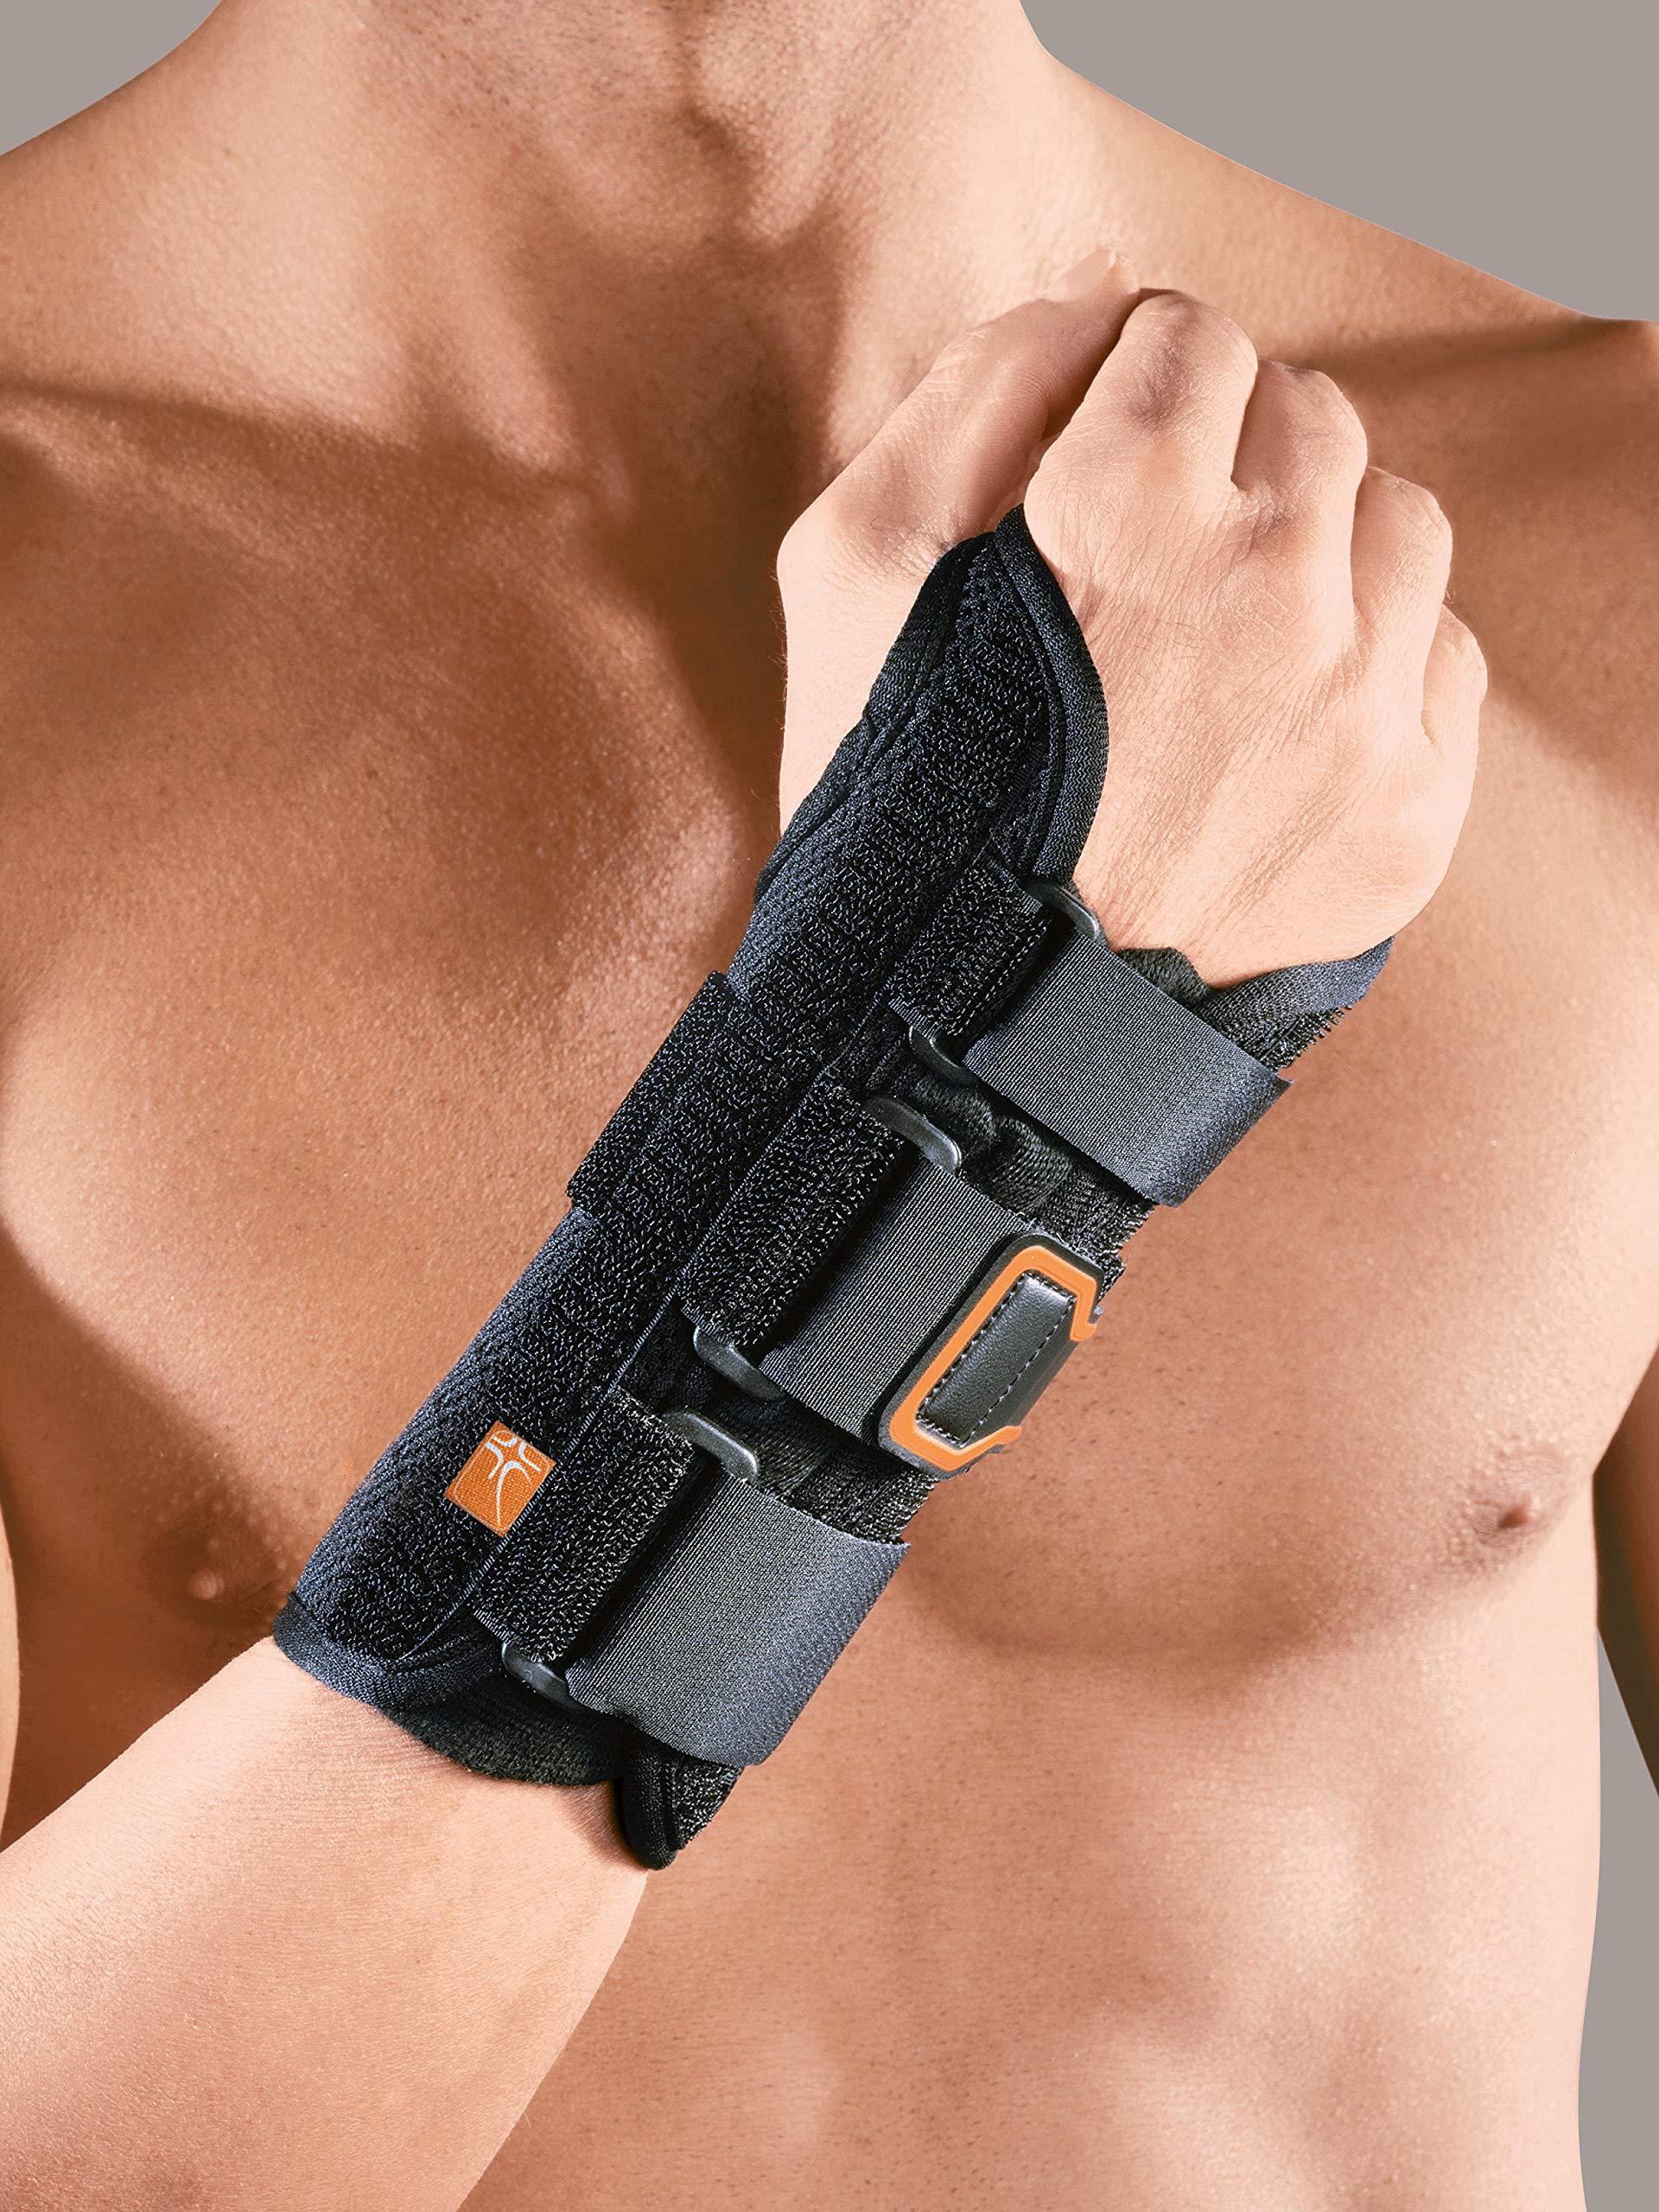 RO + Ten Opening mp1119r XL Wrist Short, Black